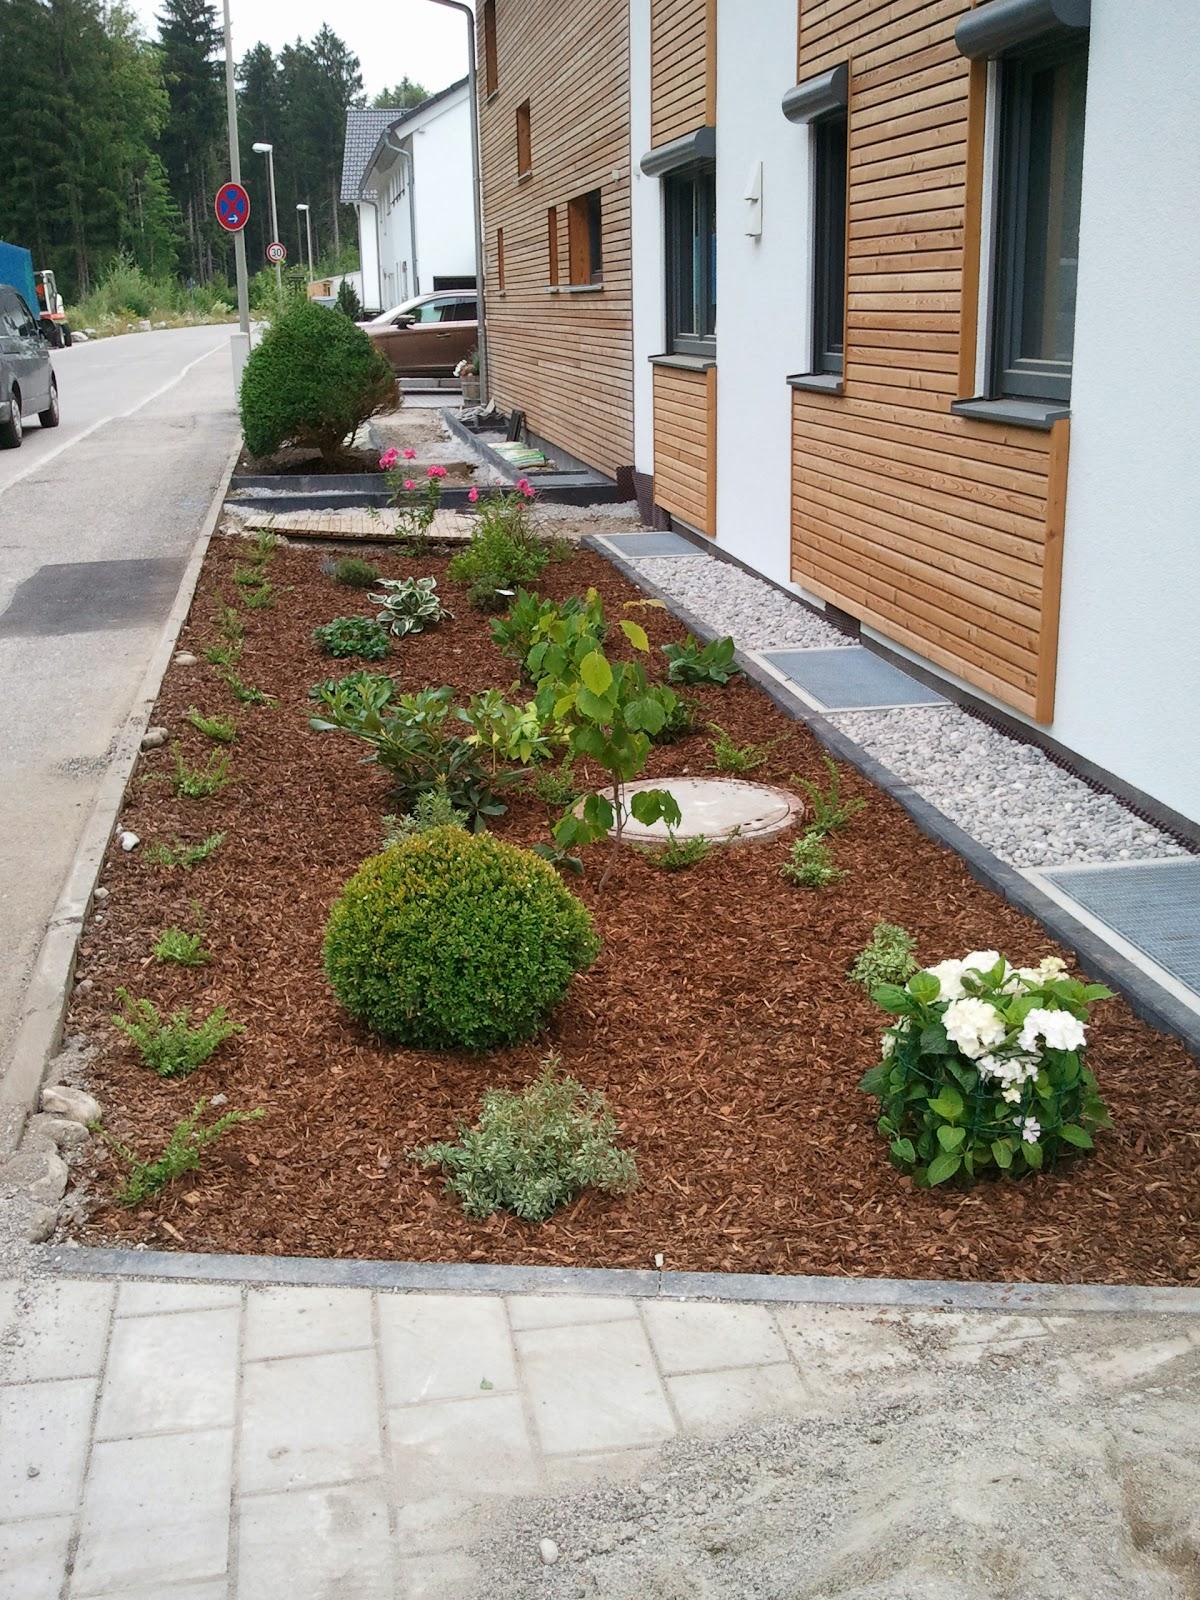 Vorgarten Mit Kies Design